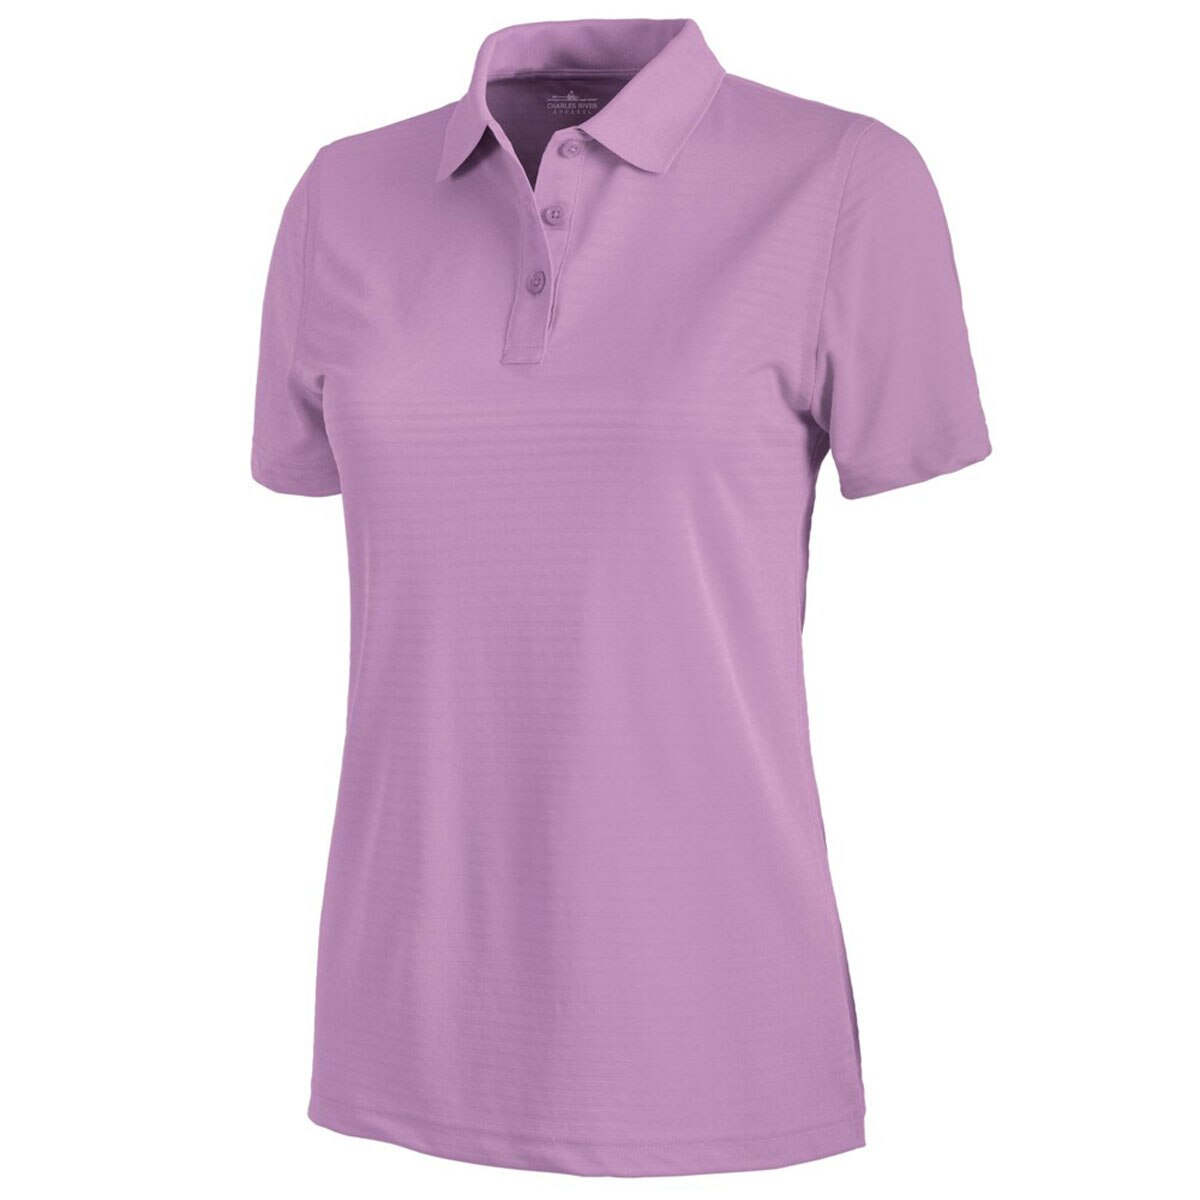 Personalized Ladies Wicking Shadow Stripe Polo Shirt